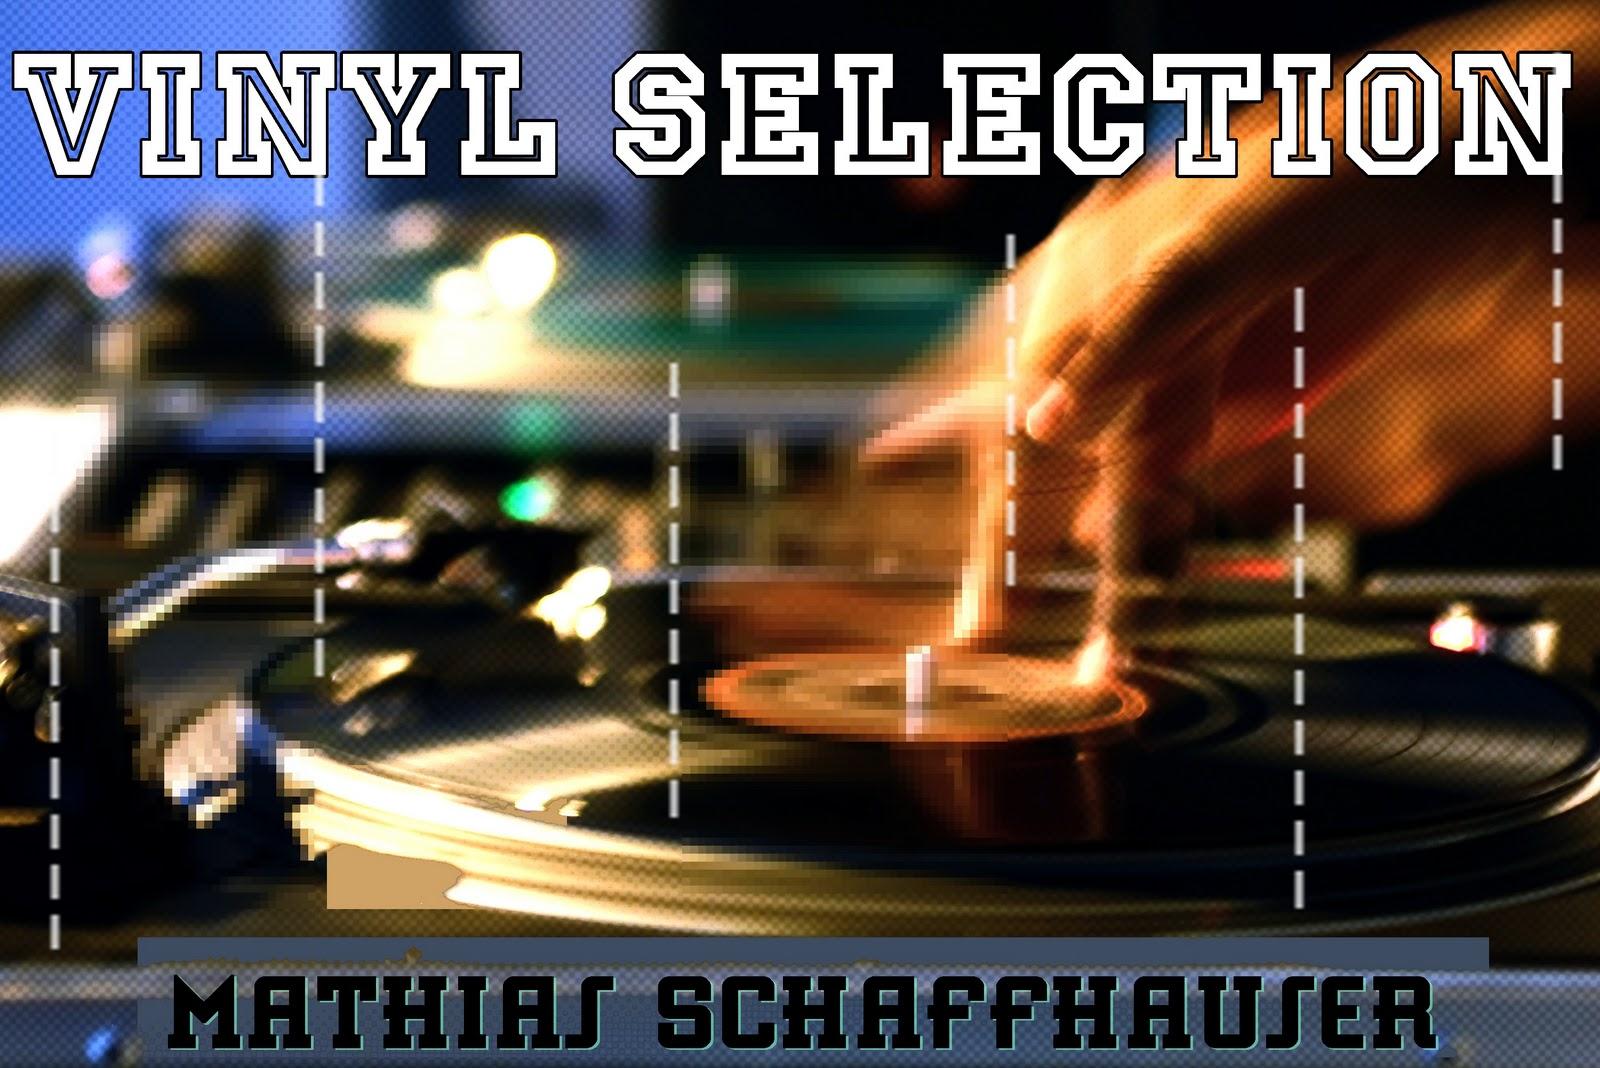 http://3.bp.blogspot.com/_qb388zIMbys/S9RkWBQSaBI/AAAAAAAACMA/iy0PAqCZemM/s1600/Vinyl+Selection.jpg